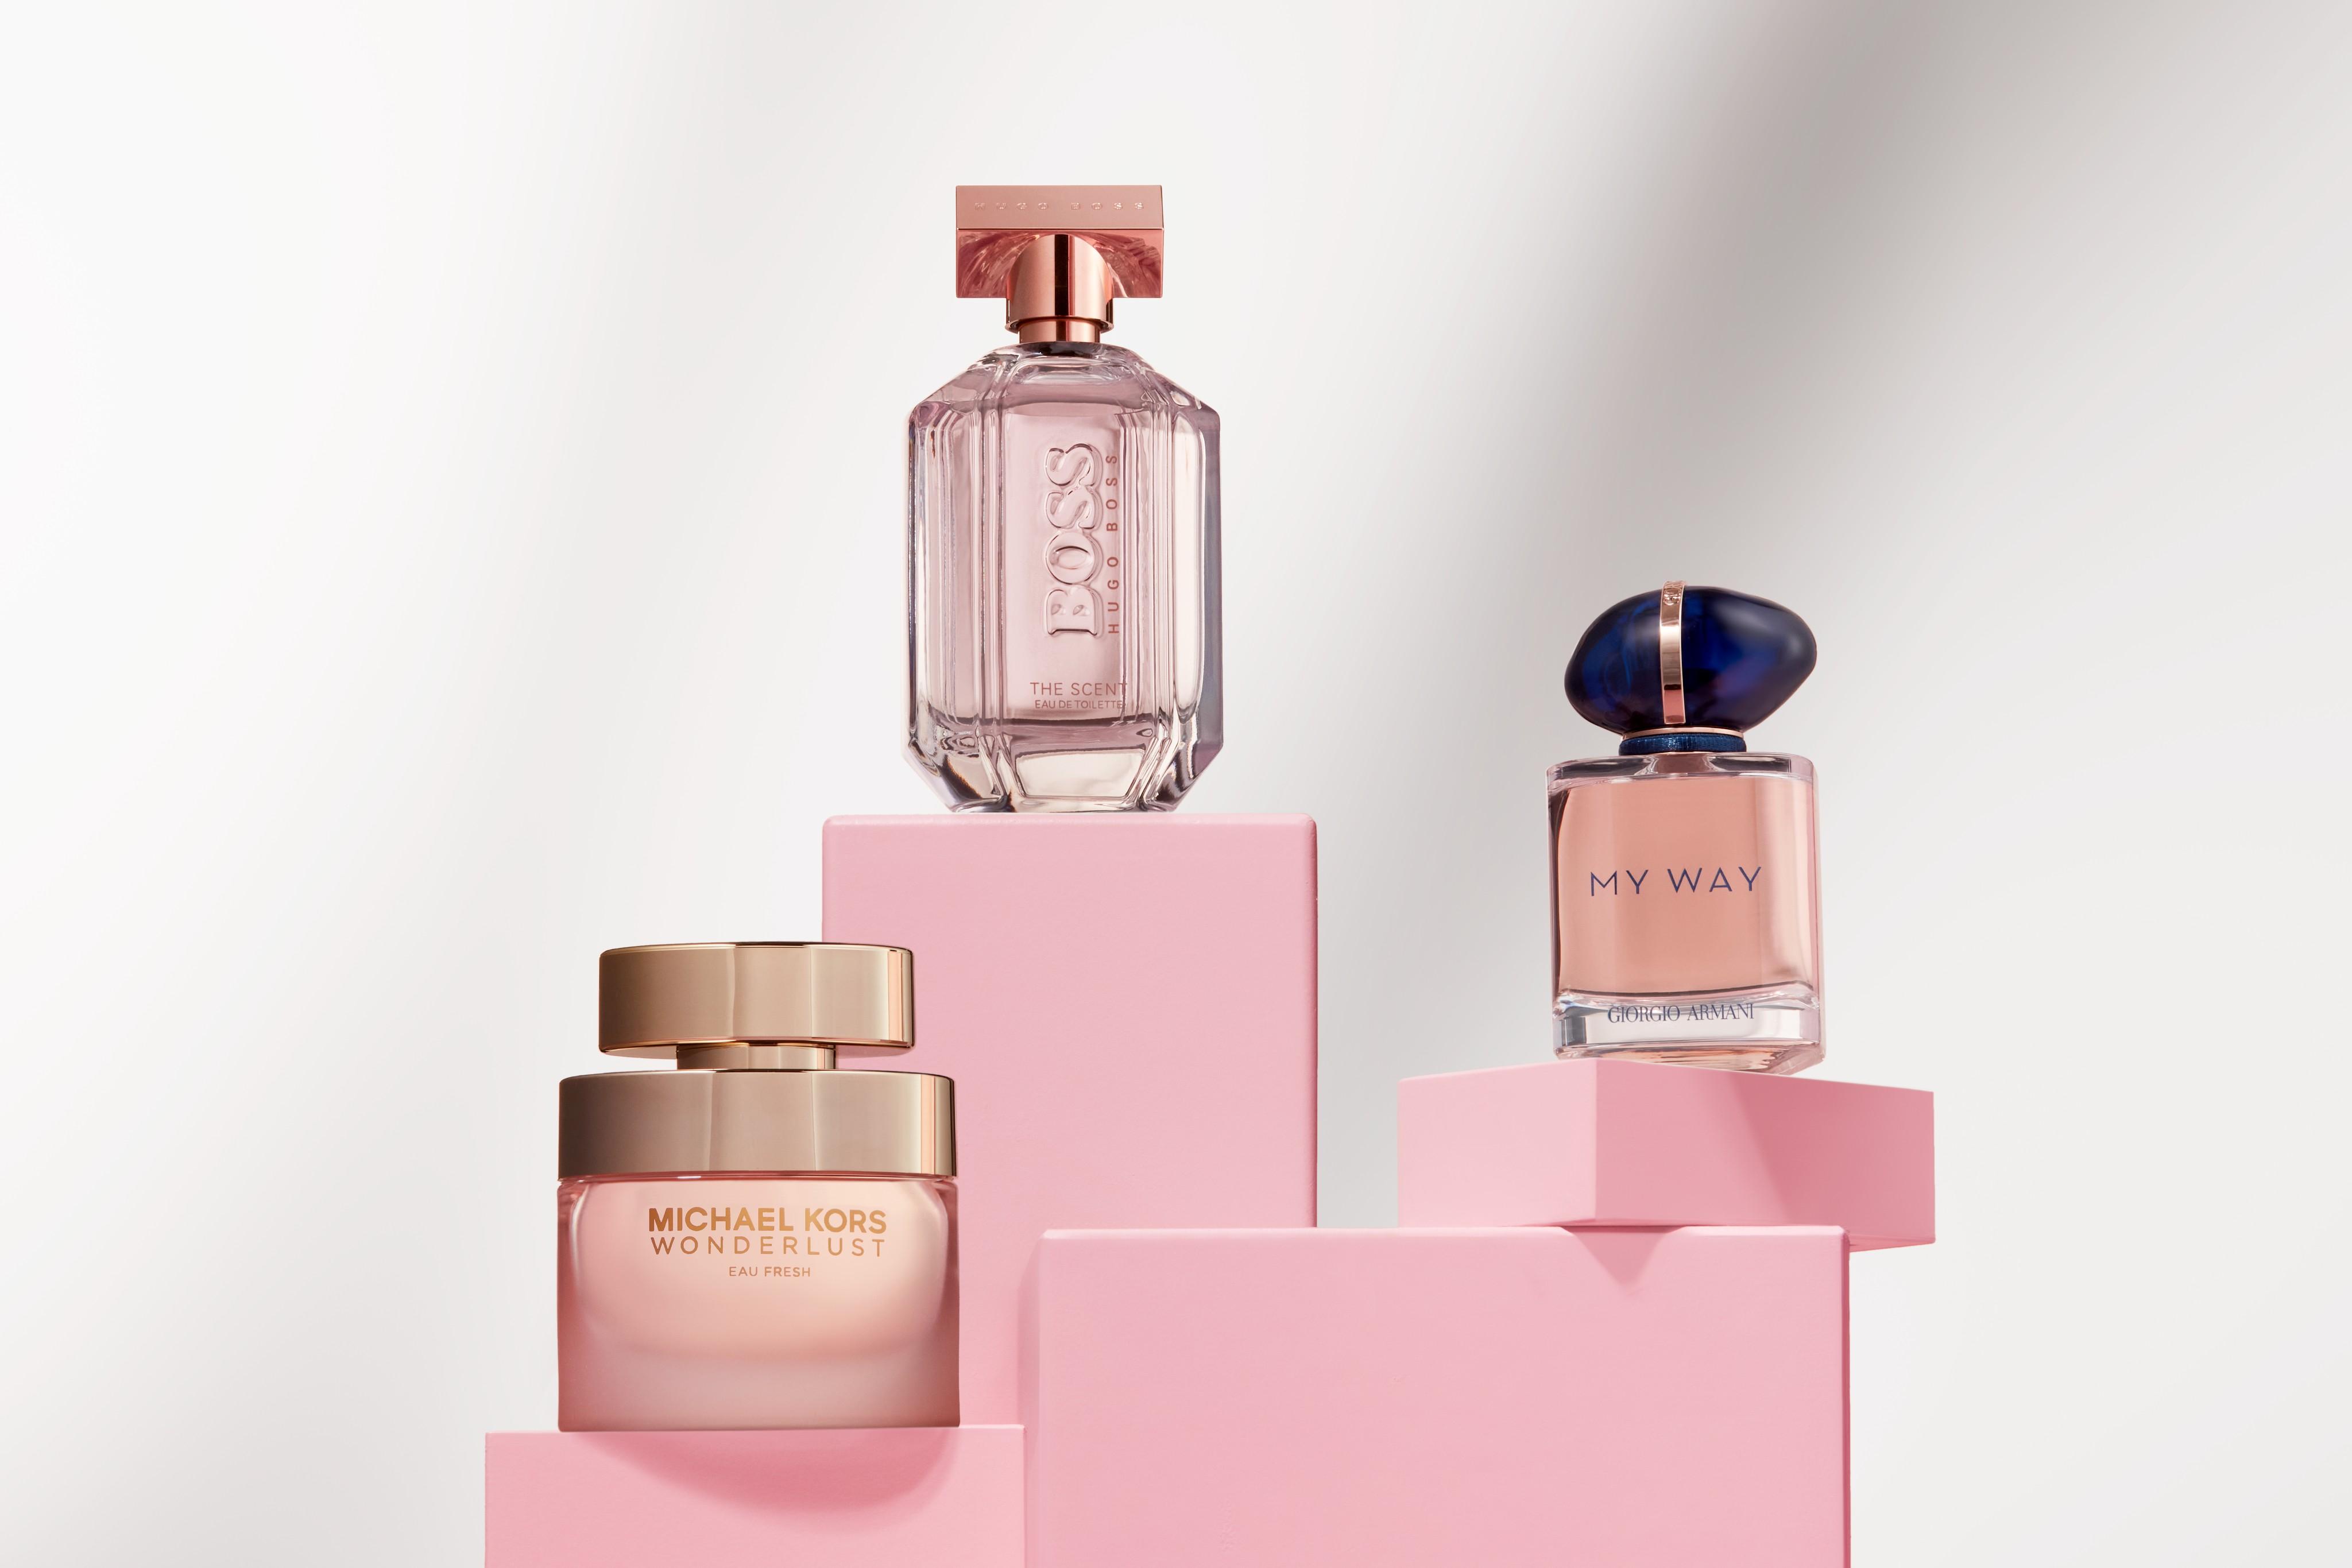 Fragrance-female-product-michaelkors-armani-hugoboss-pink-cubes-white-room-horizontal-unlimited-Web-Rendition